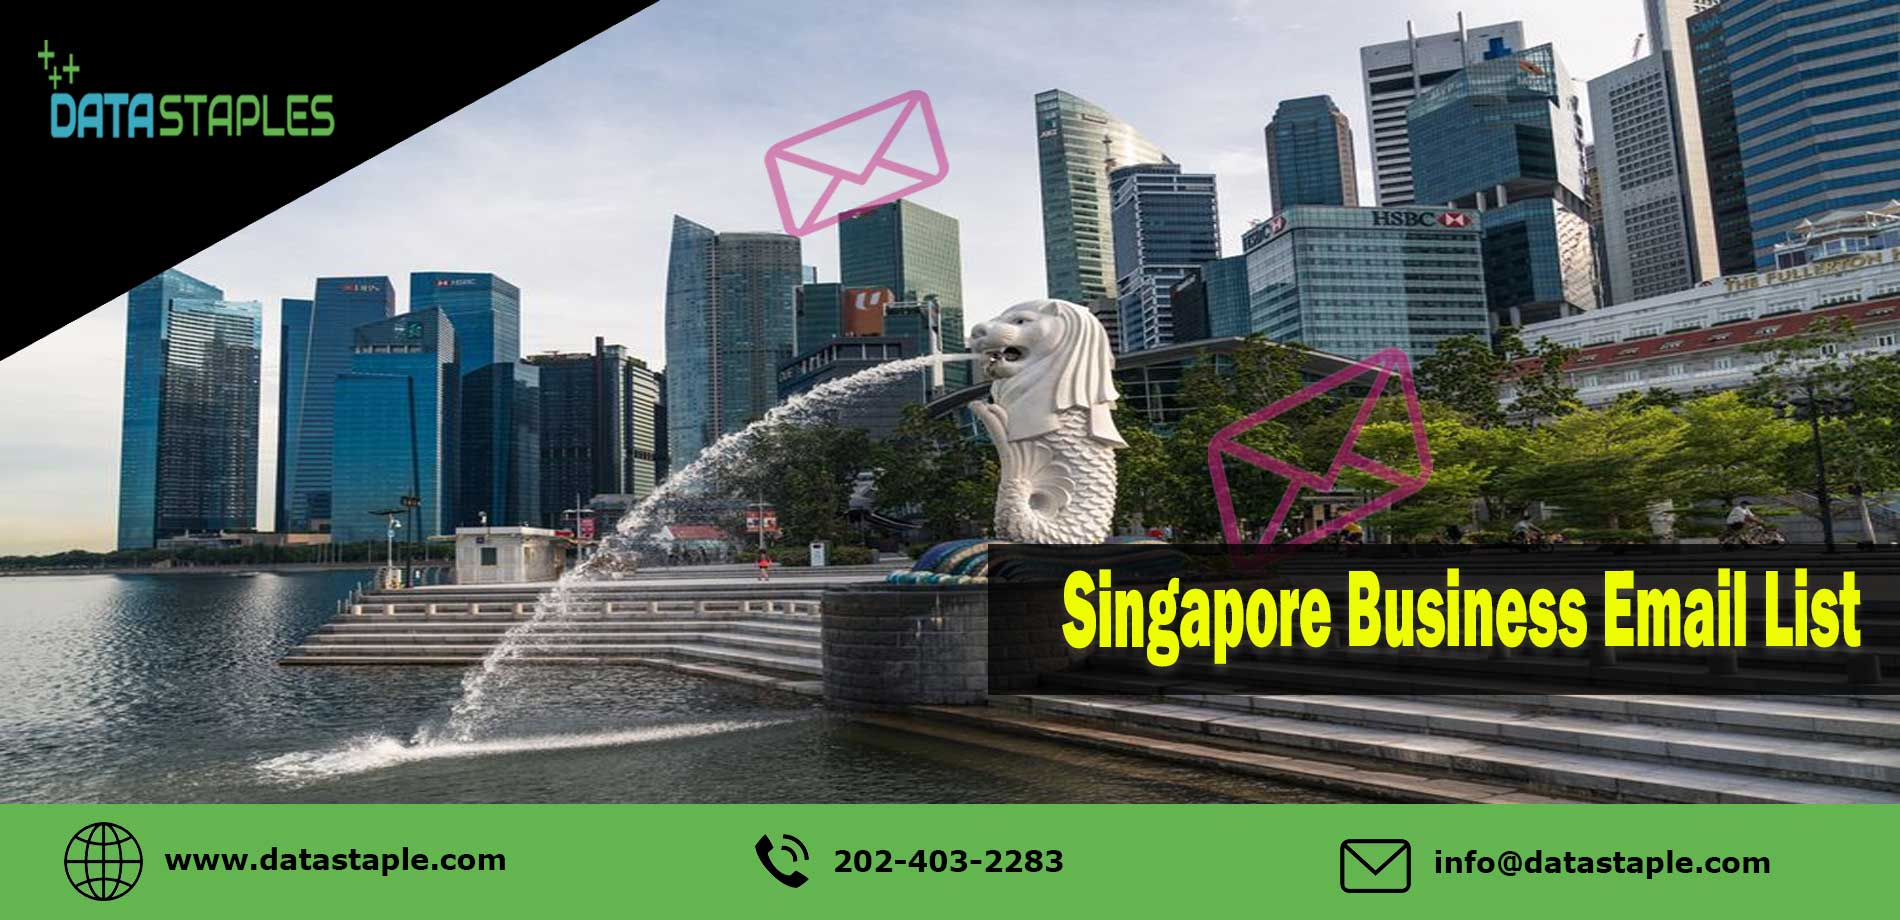 Singapore Business Email List   DataStaples